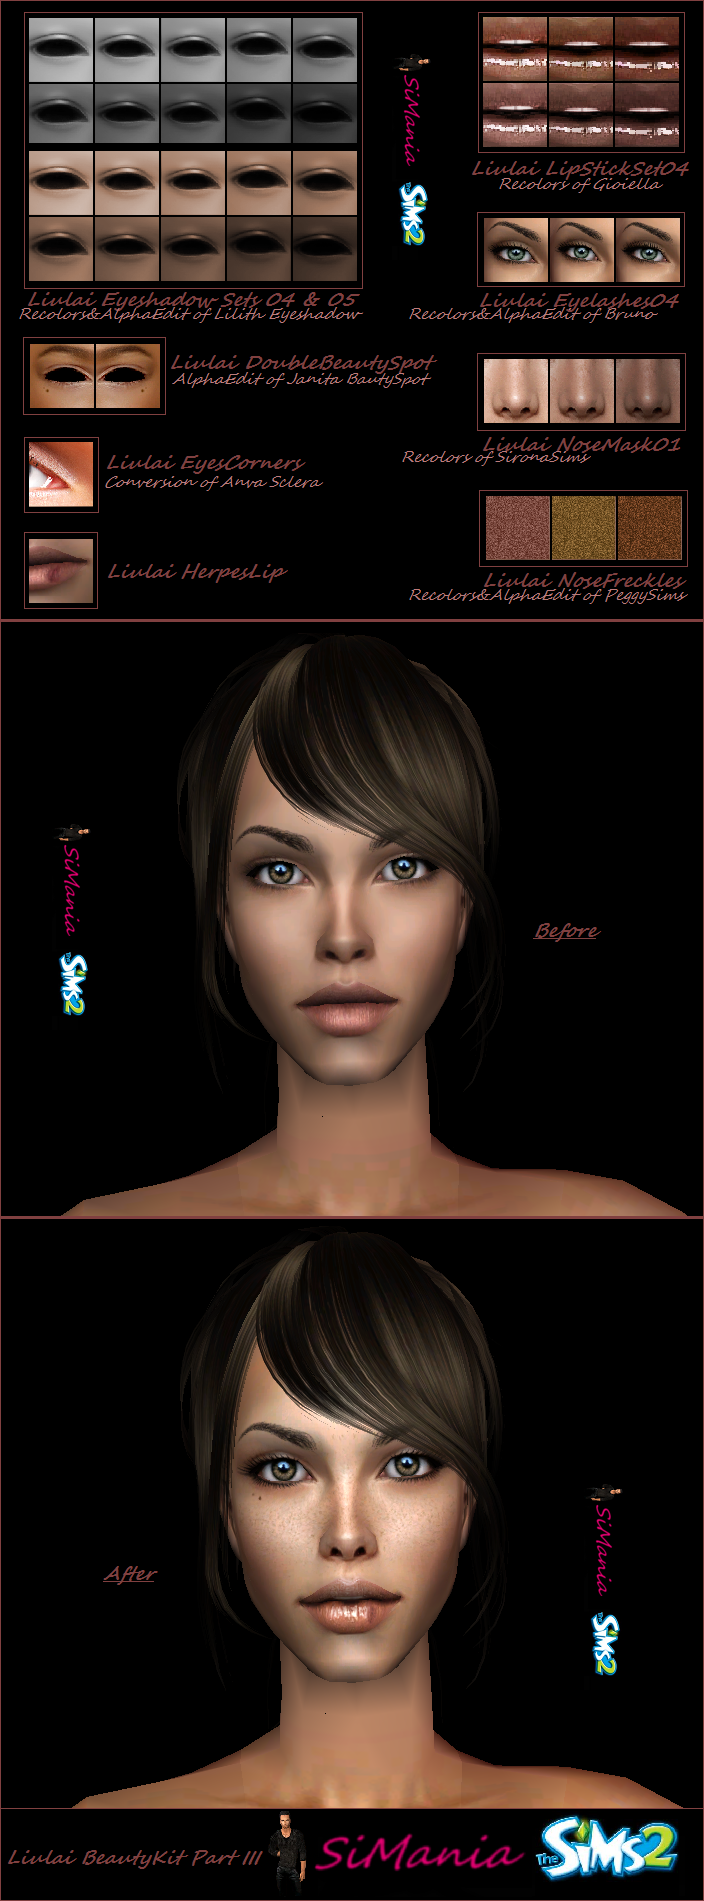 BeautyKit-Part III